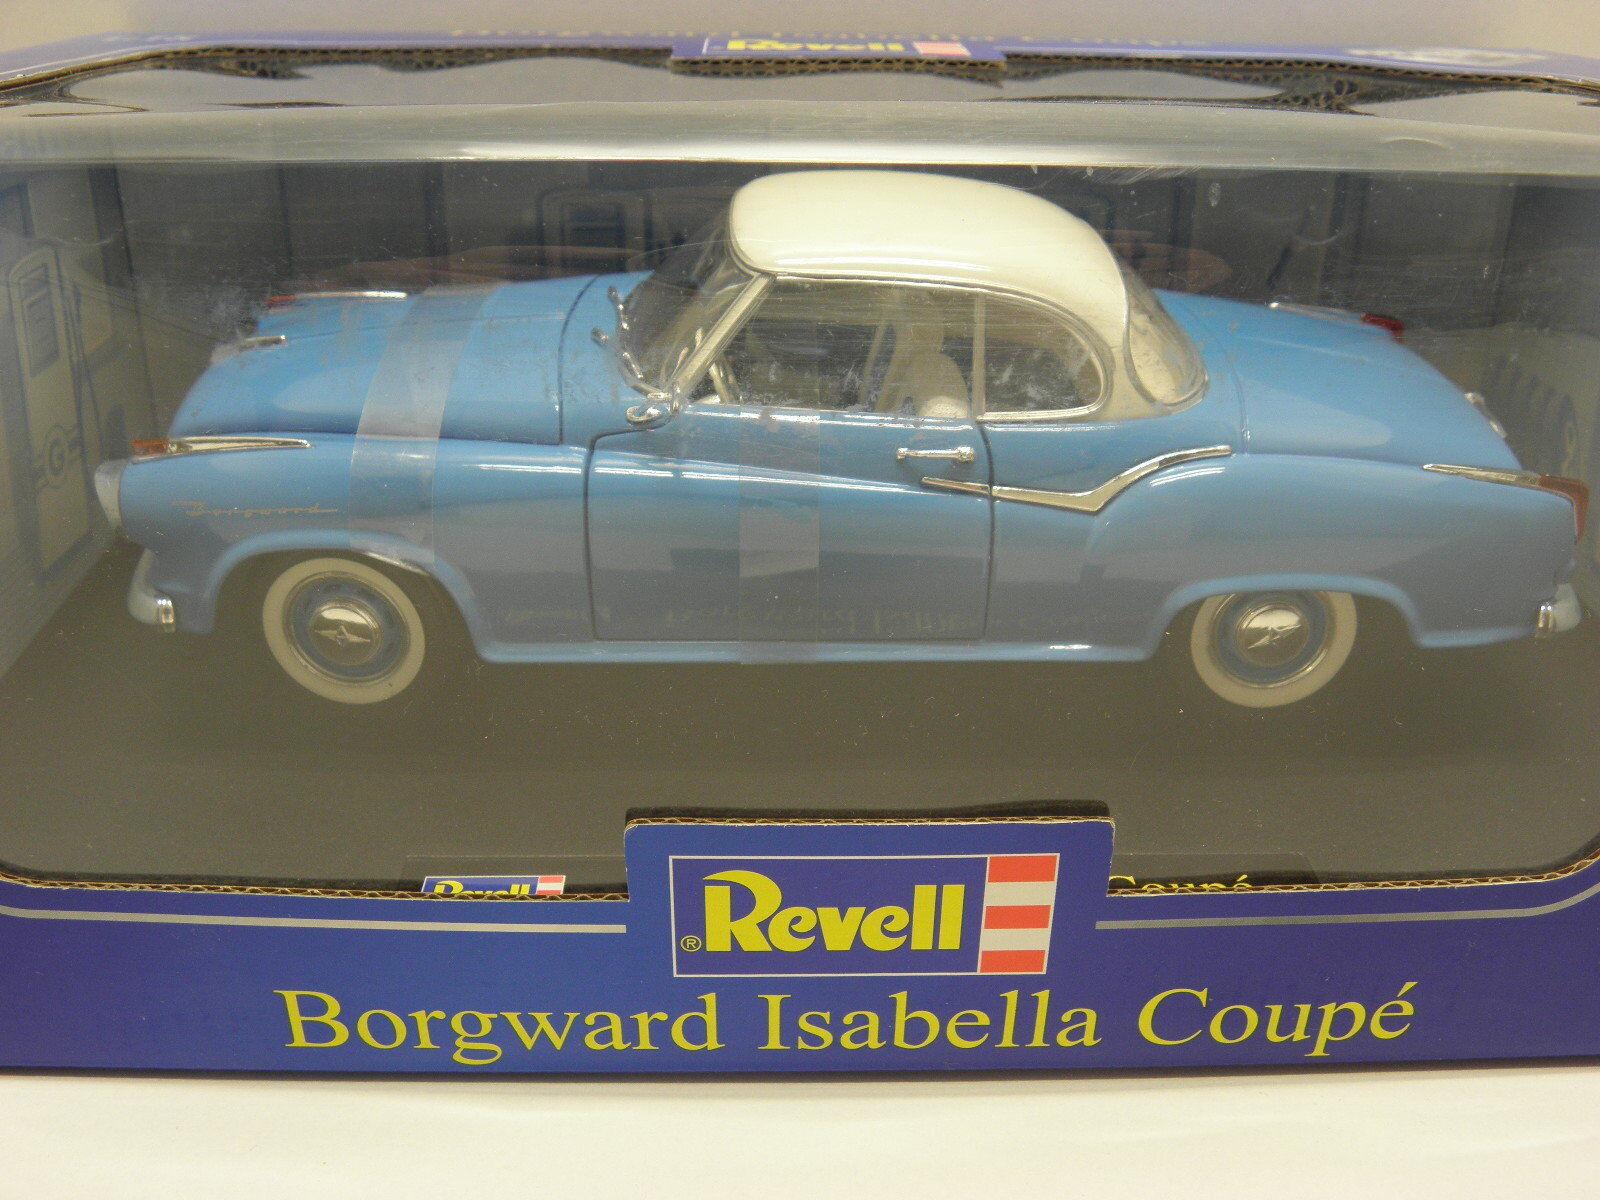 REVELL 08859 sammelmodell Borgward Isabella coupè METAL m.1:18